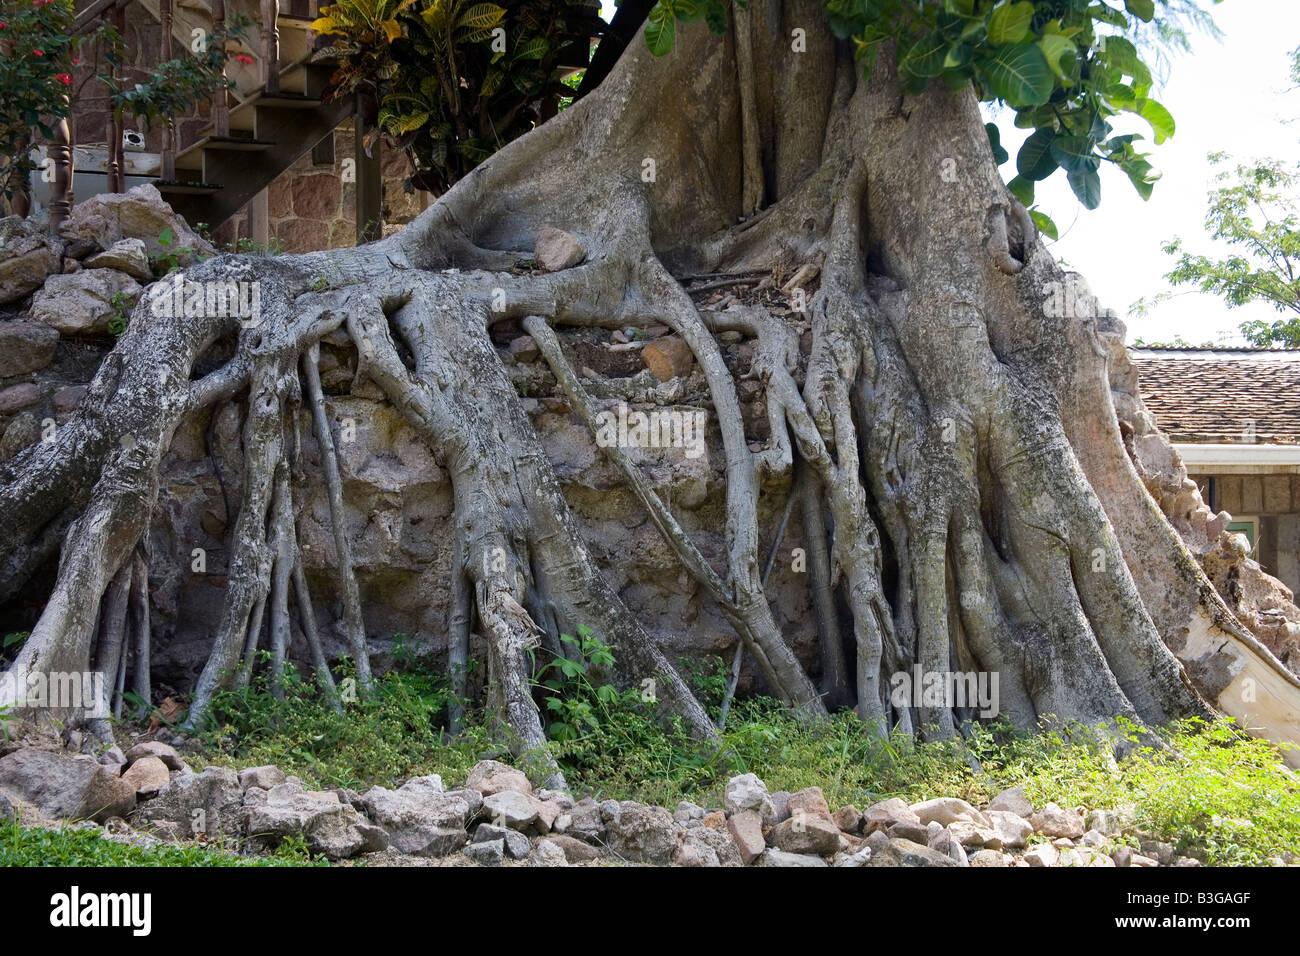 Unusual hugh spreading tree roots - Stock Image